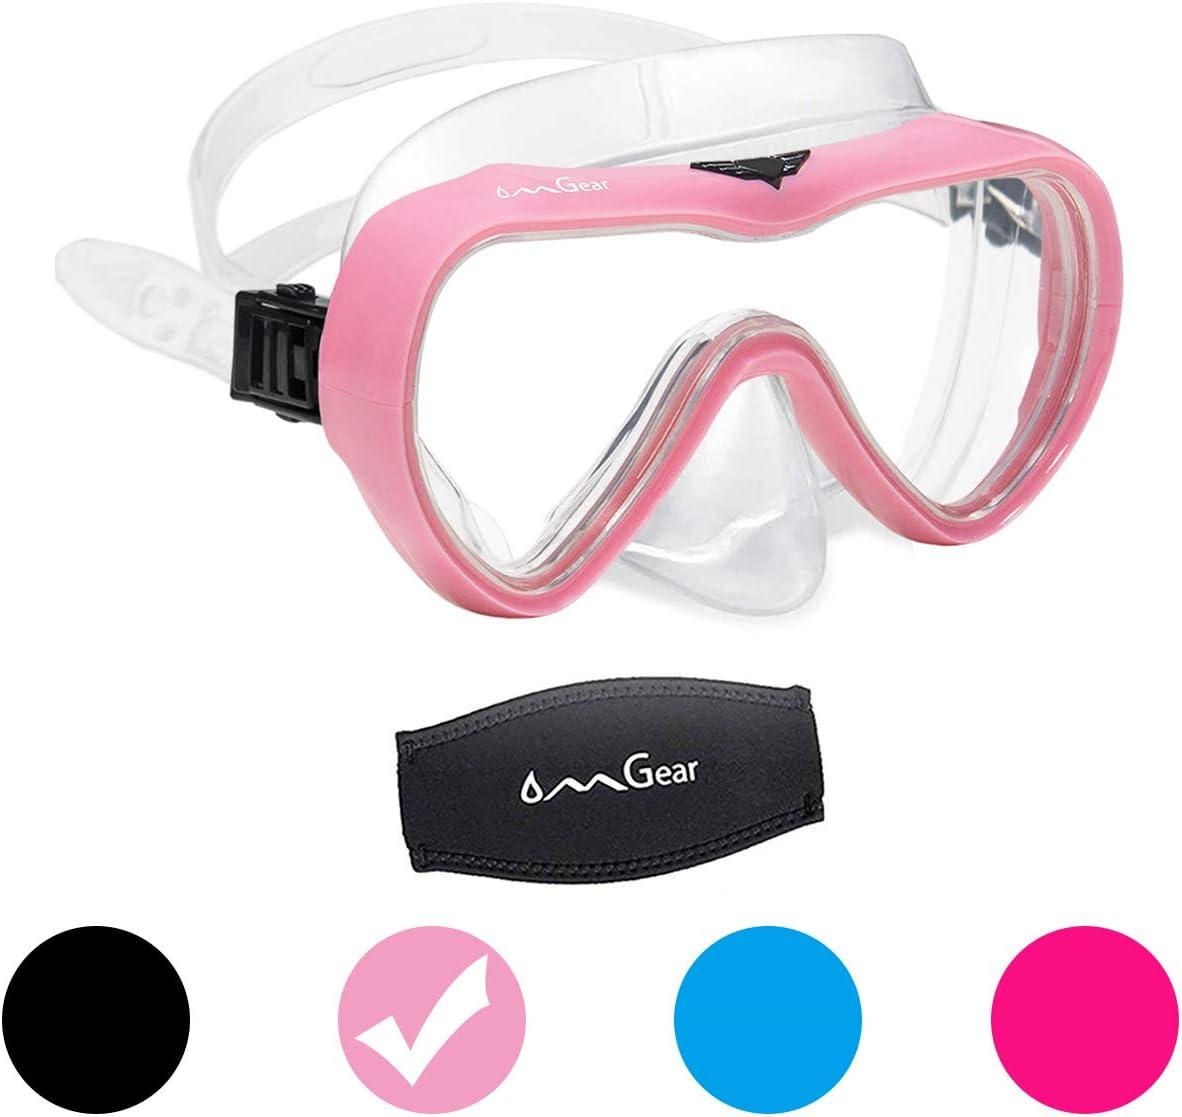 OMGear Diving Mask Snorkeling Gear Adult Kids Snorkel price Dive Ranking TOP17